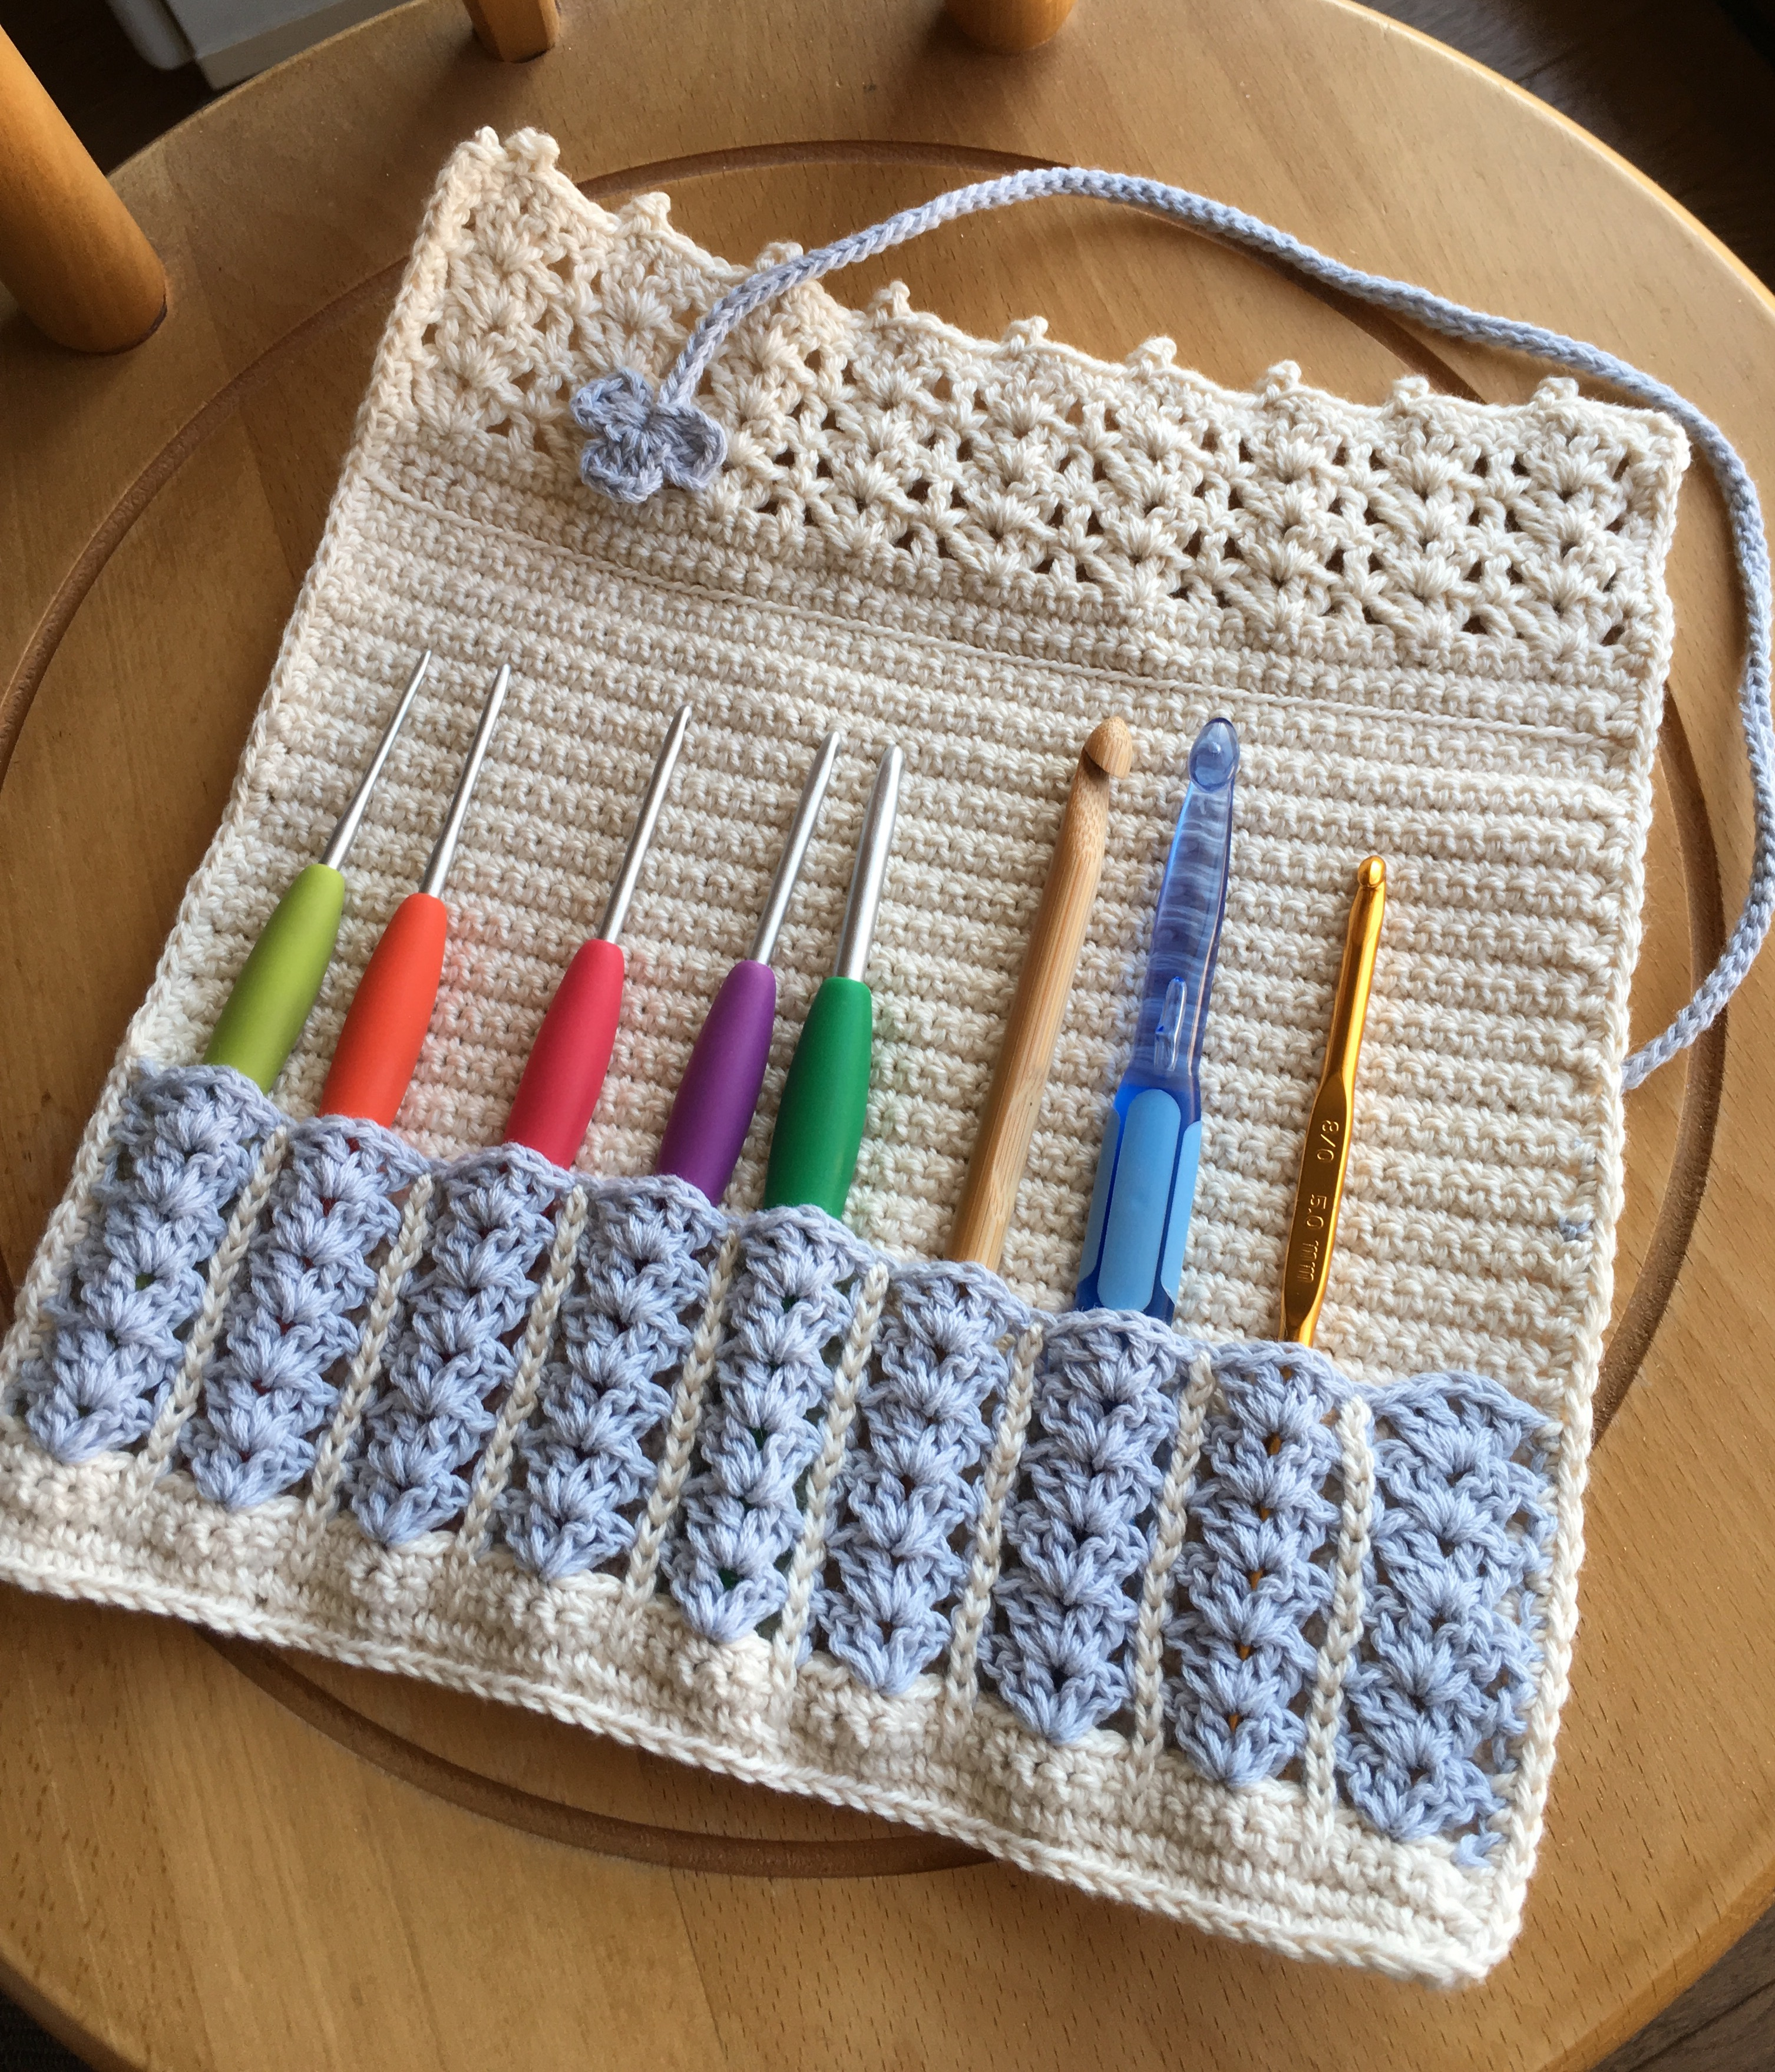 Plunket Book Cover Pattern : 新着記事一覧 毛糸とビスケット 編み物記録 楽天ブログ